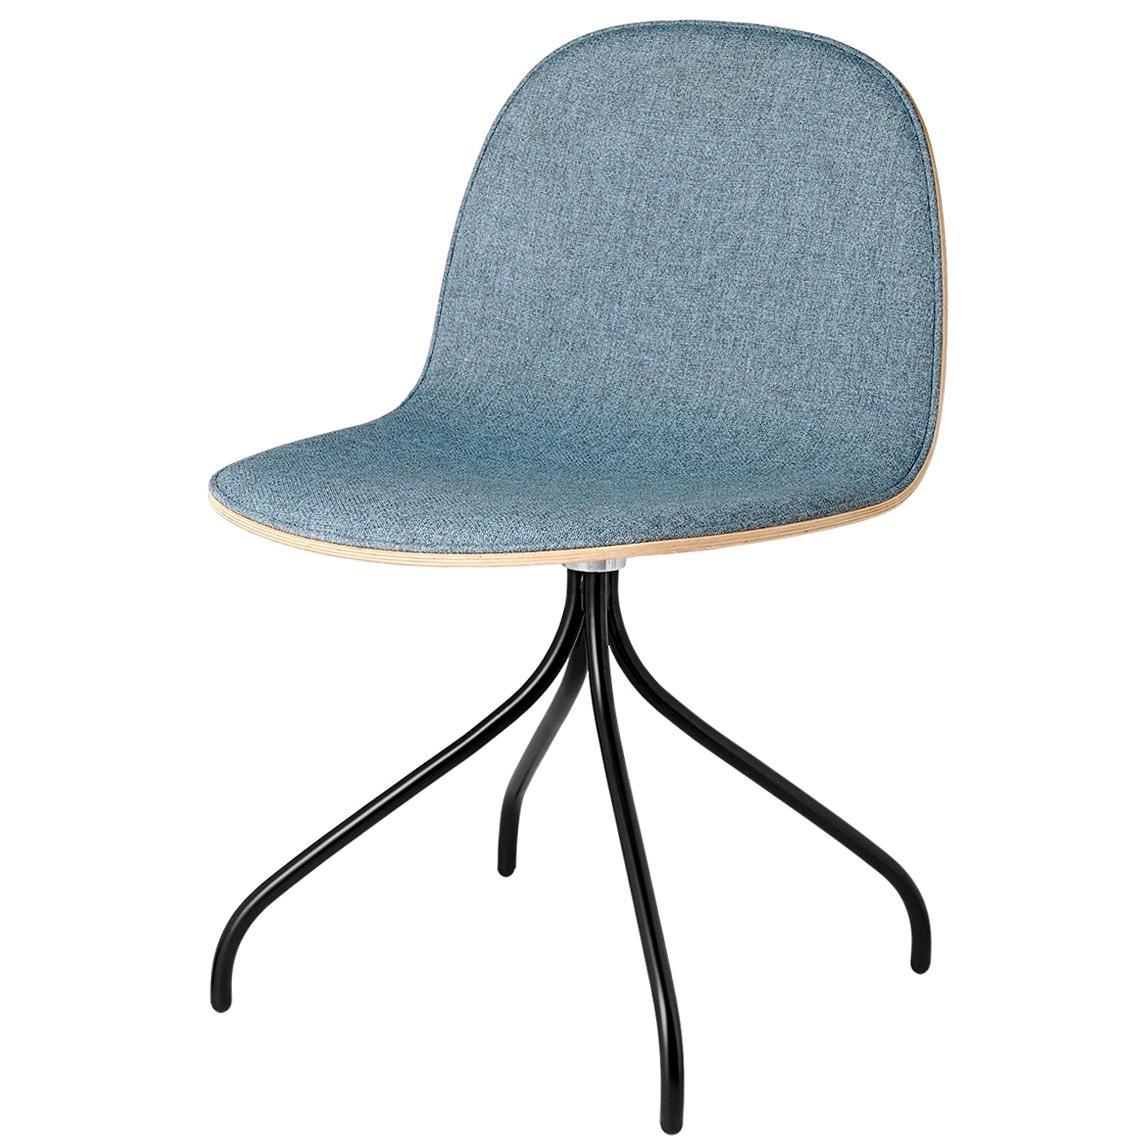 2D Meeting Chair, Front Upholstered, Chrome Swivel Base, Natural Oak